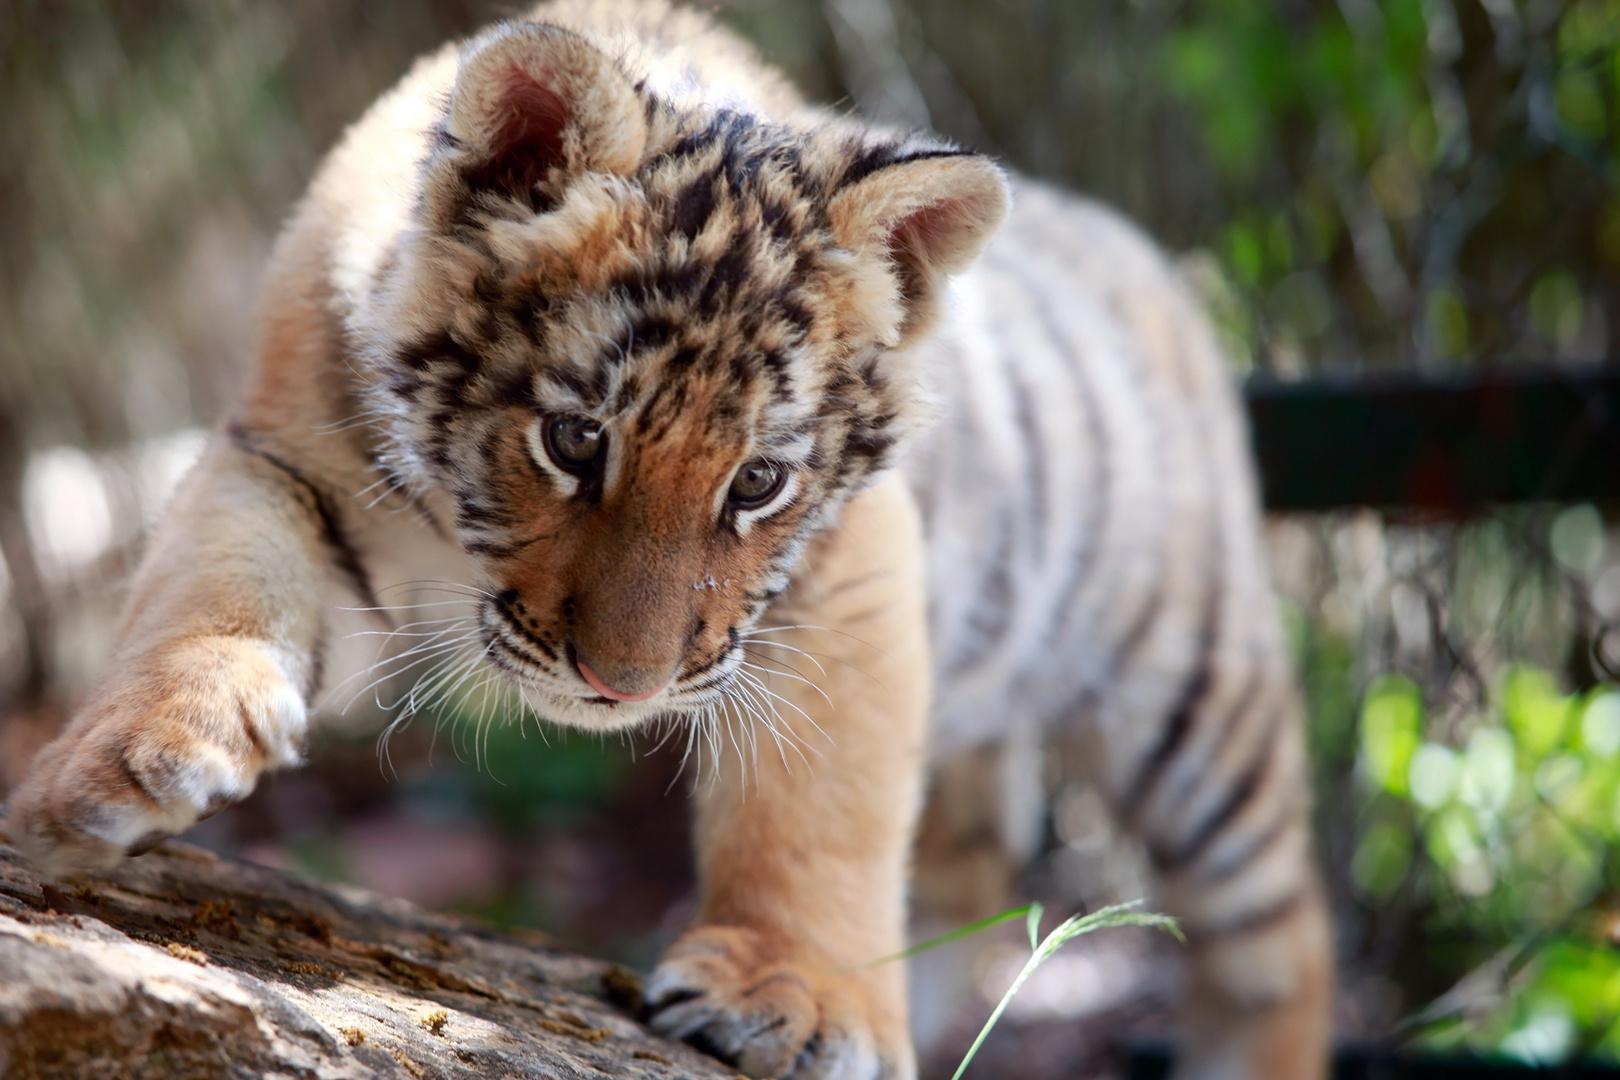 tiger baby foto bild tiere tierkinder ordner1 bilder. Black Bedroom Furniture Sets. Home Design Ideas